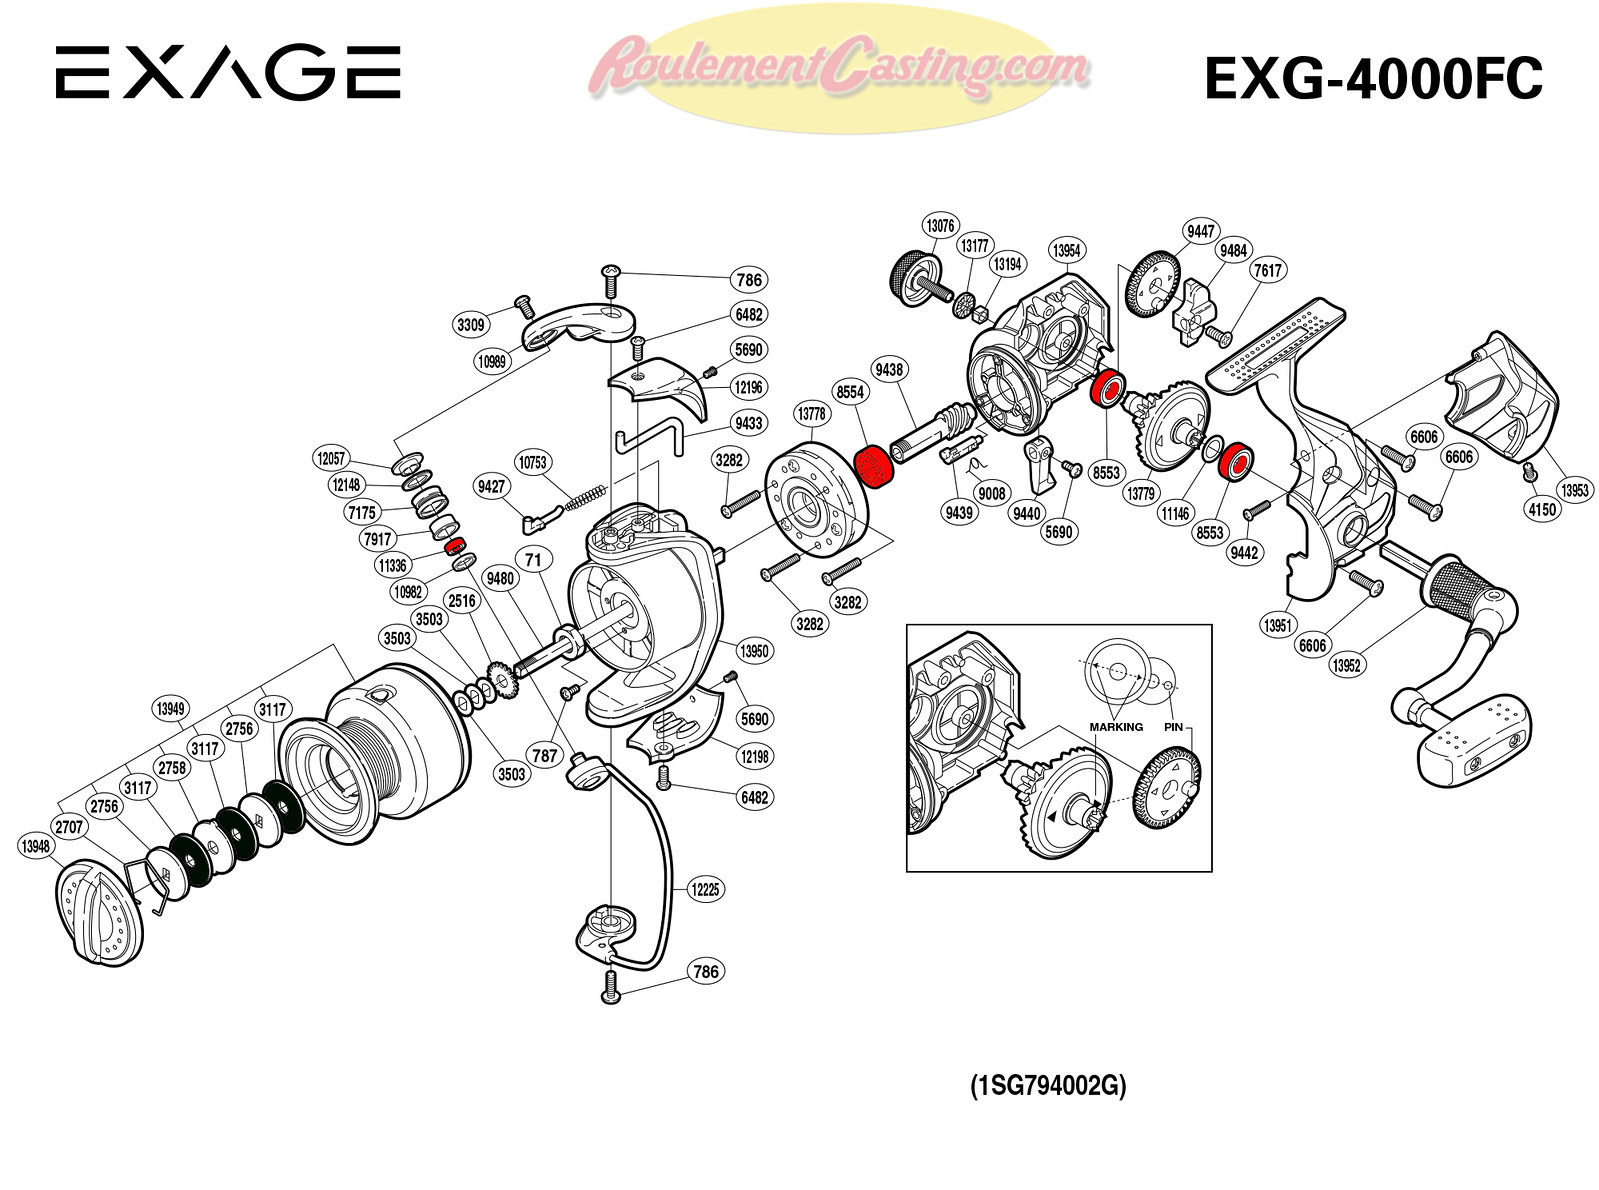 Schema-Shimano-EXAGE-4000FC